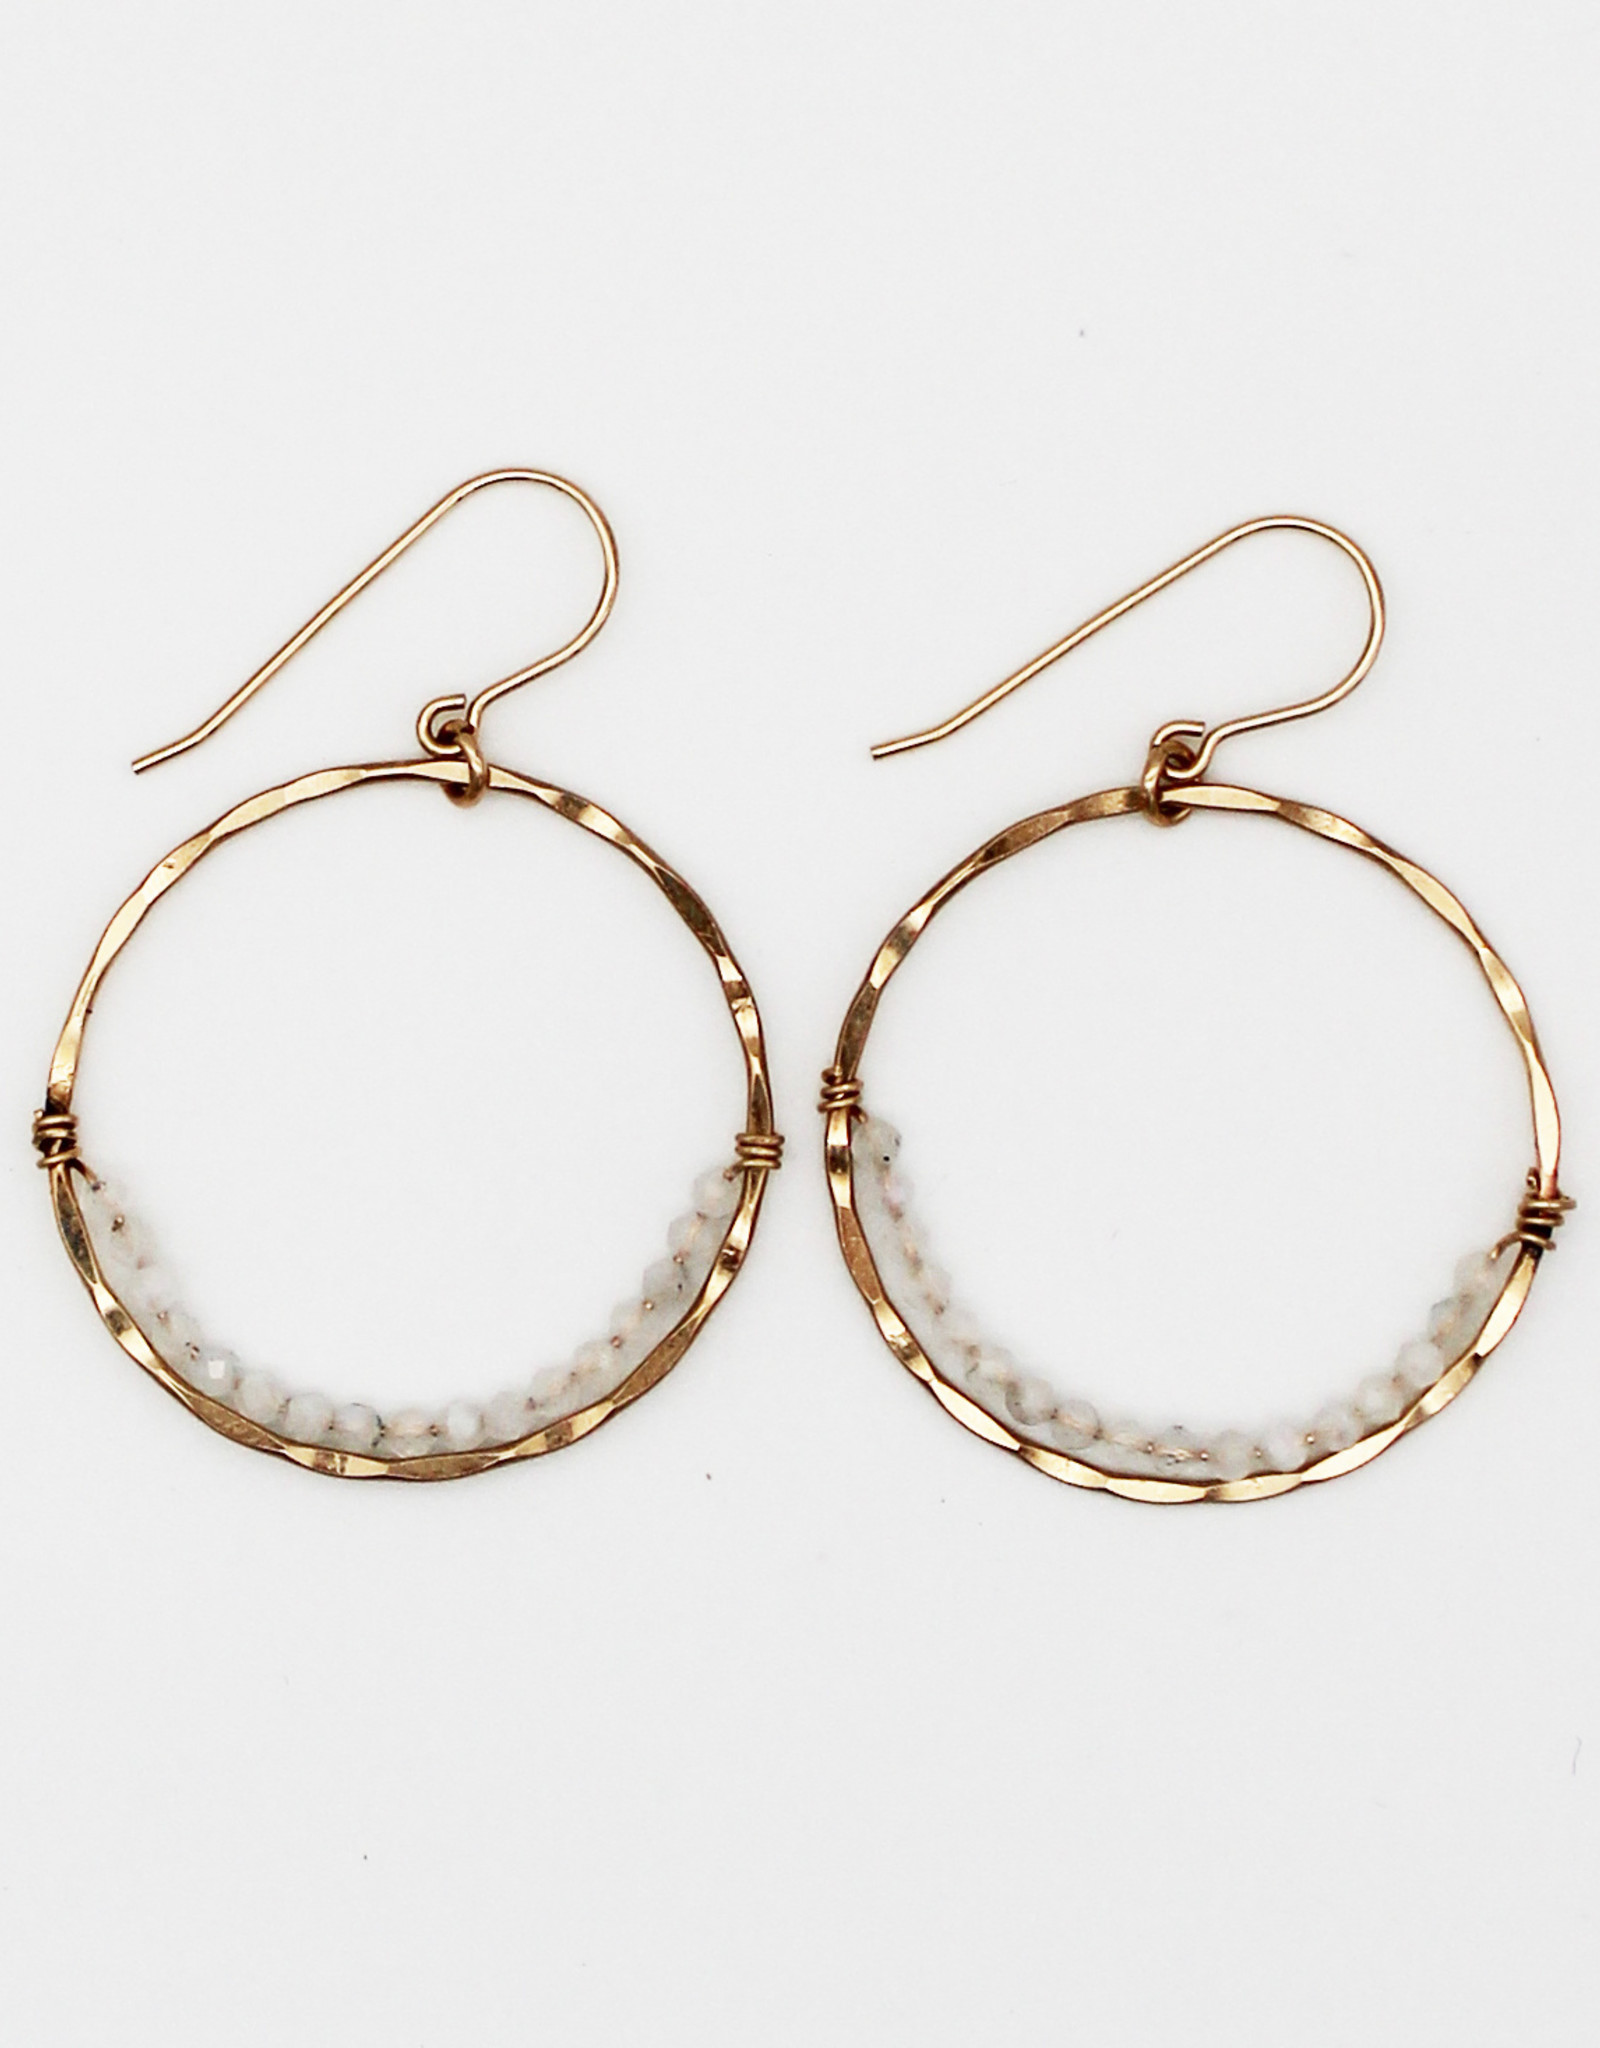 Amy Joy Jewelry AJ22 Moonstone Hoops